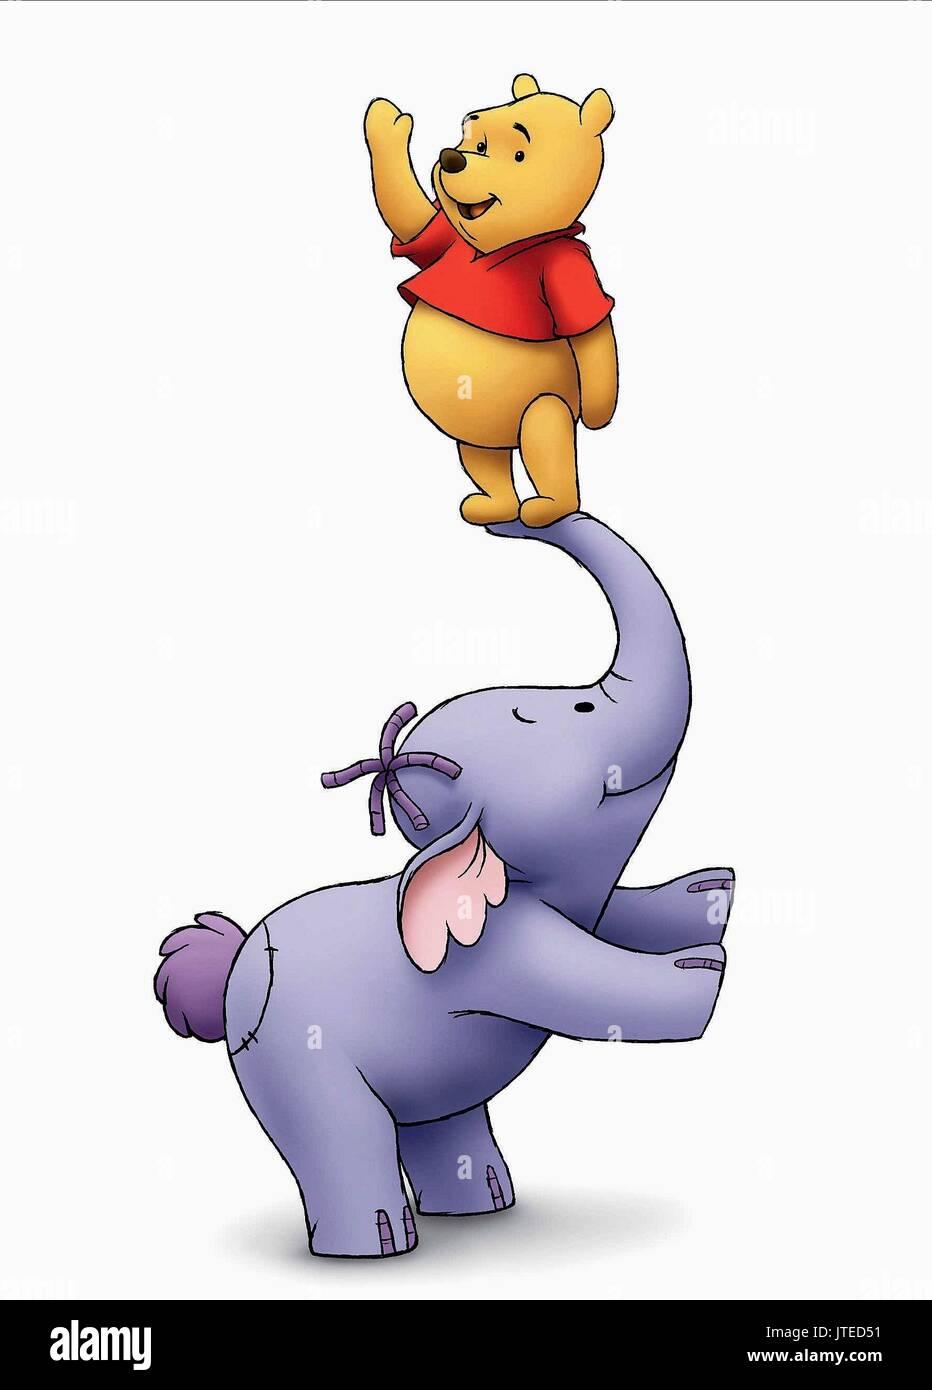 Uncategorized Winnie The Pooh Lumpy winnie the pooh lumpy poohs heffalump movie 2005 stock photo 2005